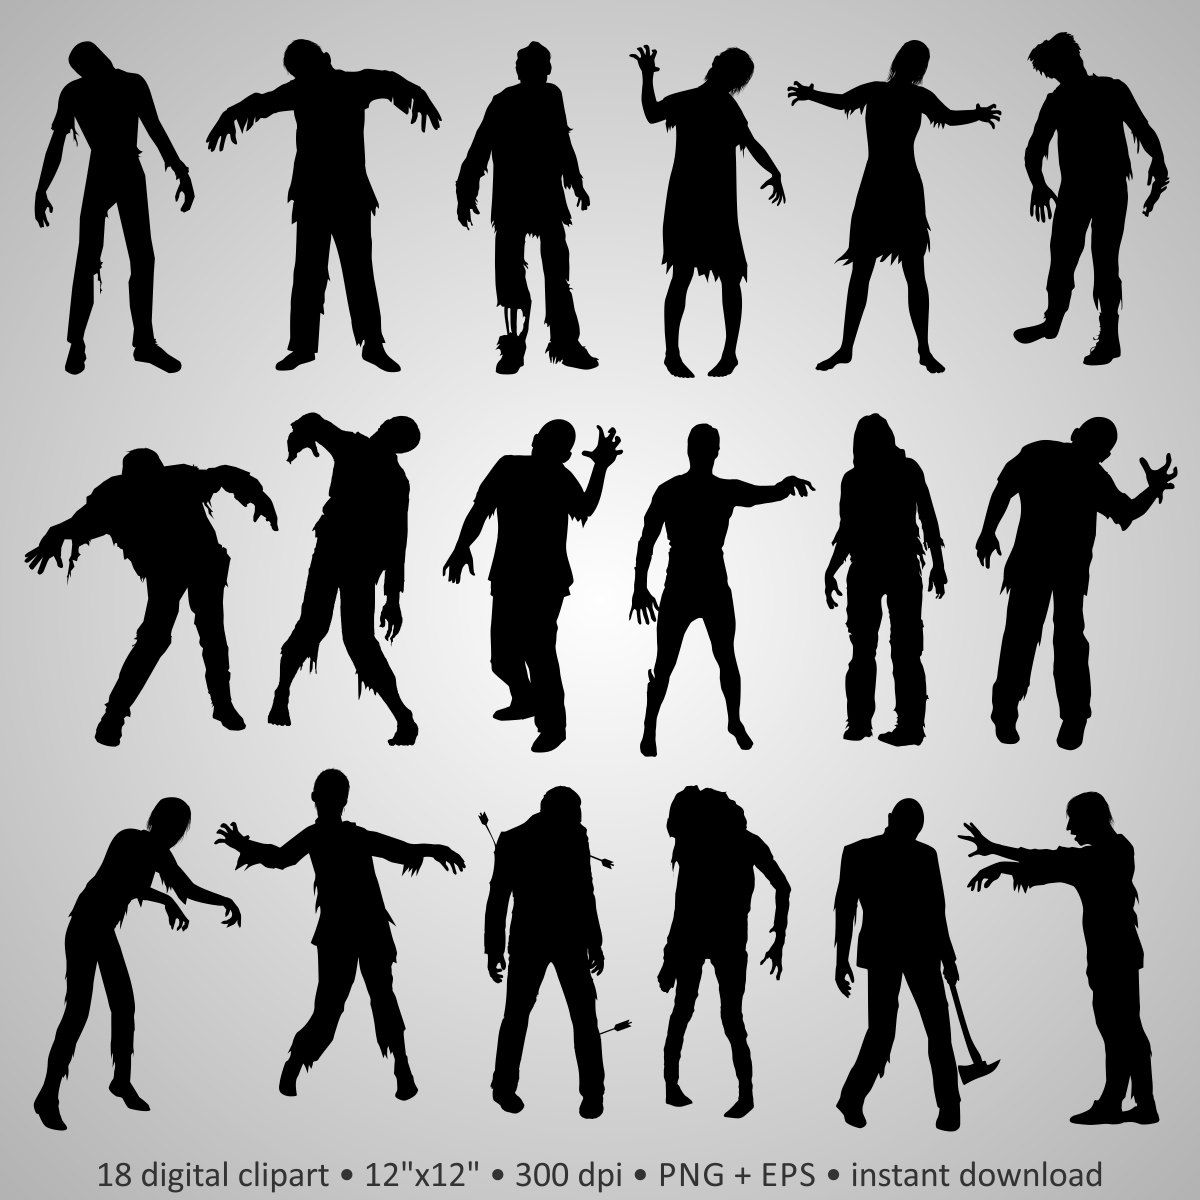 Buy 2 Get 1 Free! Digital Clipart Zombie Silhouettes, walking dead ...